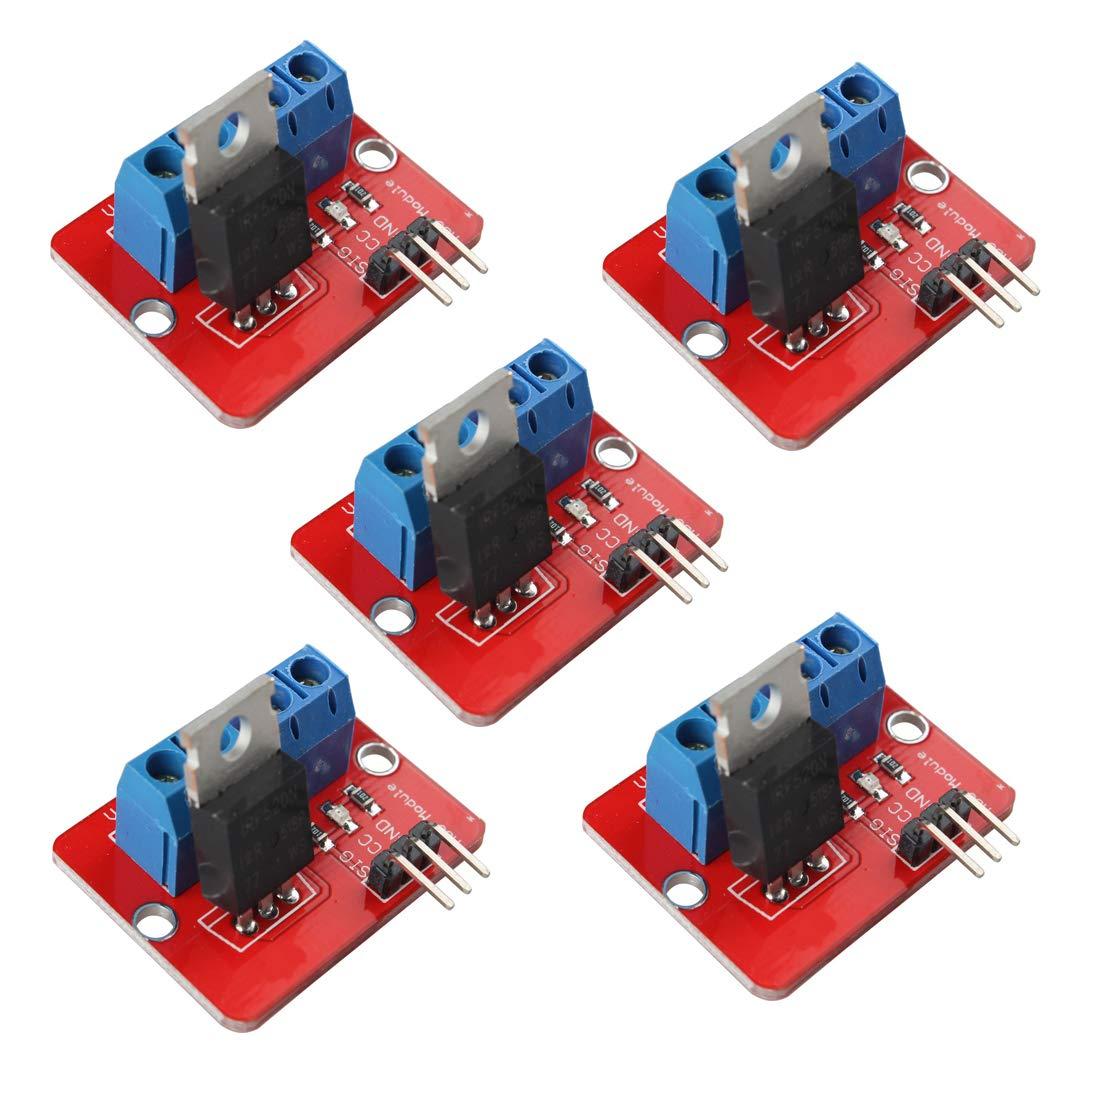 Amazon.com: hiletgo irf520 MOSFET módulo de driver MOSFET ...